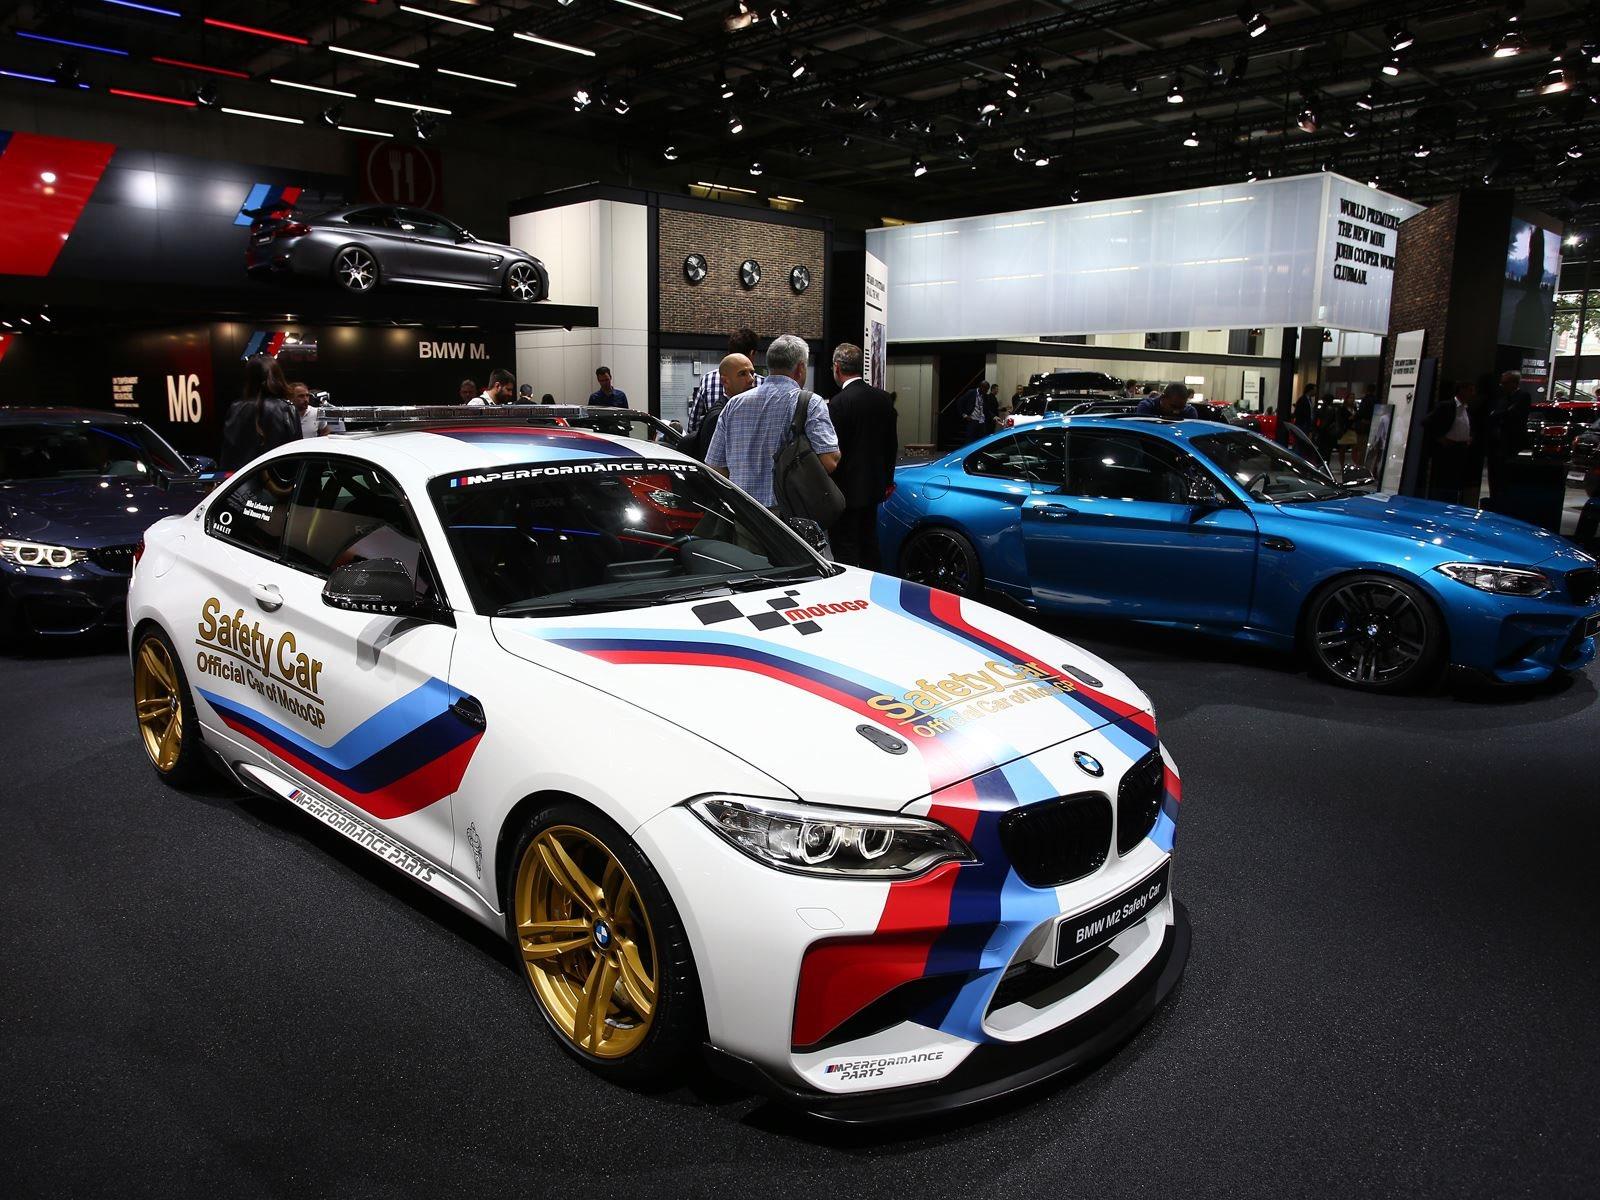 BMW Confirms World Premiere For Paris Motor Show CarBuzz - Bmw car show